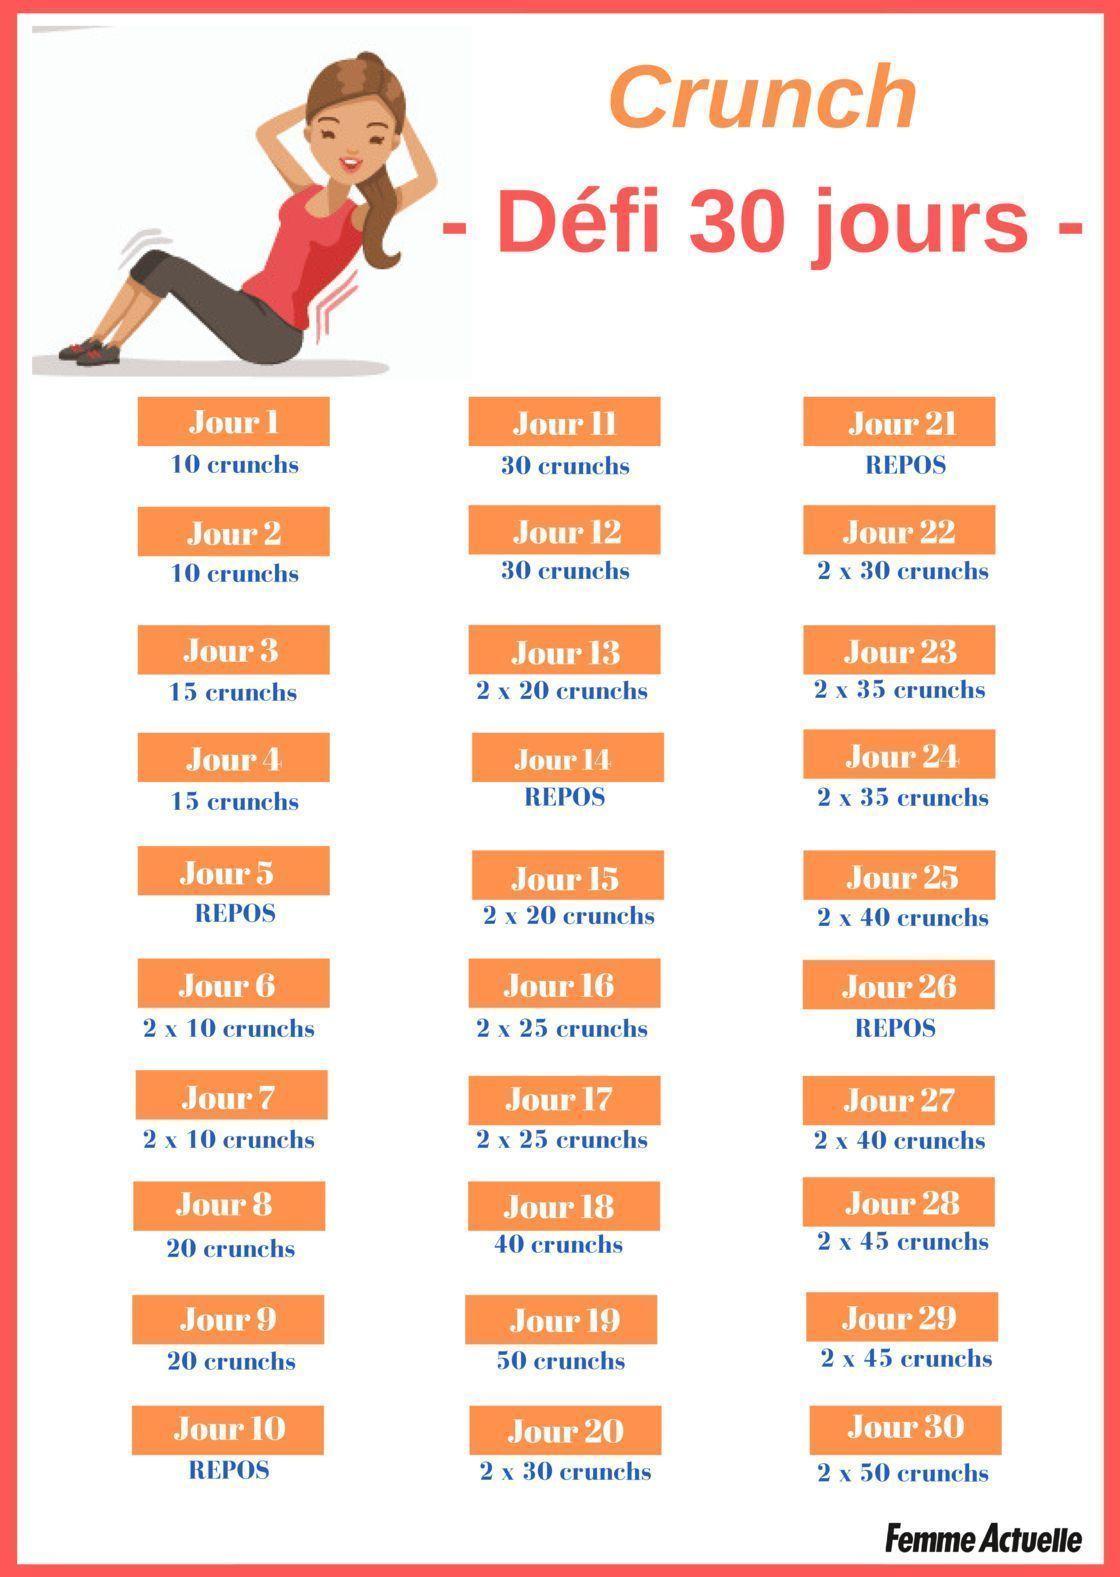 Crunch : challenge 30 jours pour muscler ses abdos